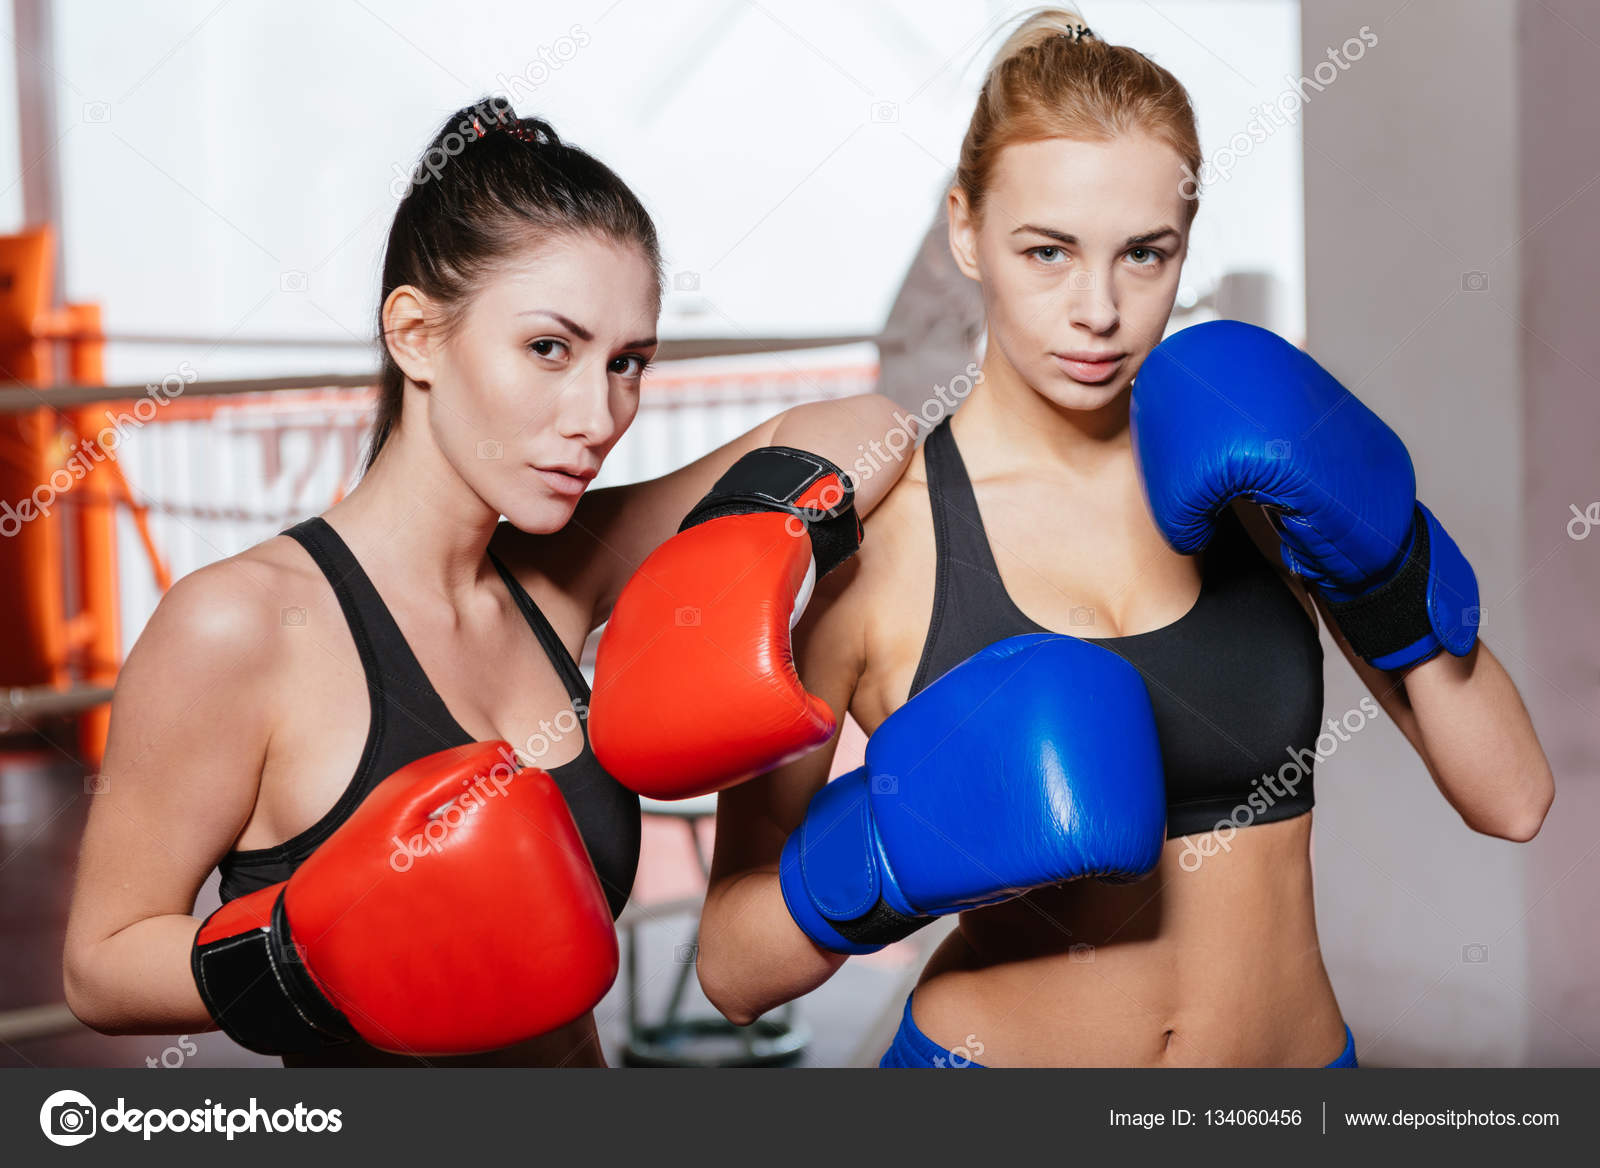 Boxeuse Sexy boxeuses sexy fortes de modélisation — photographie yacobchuk1